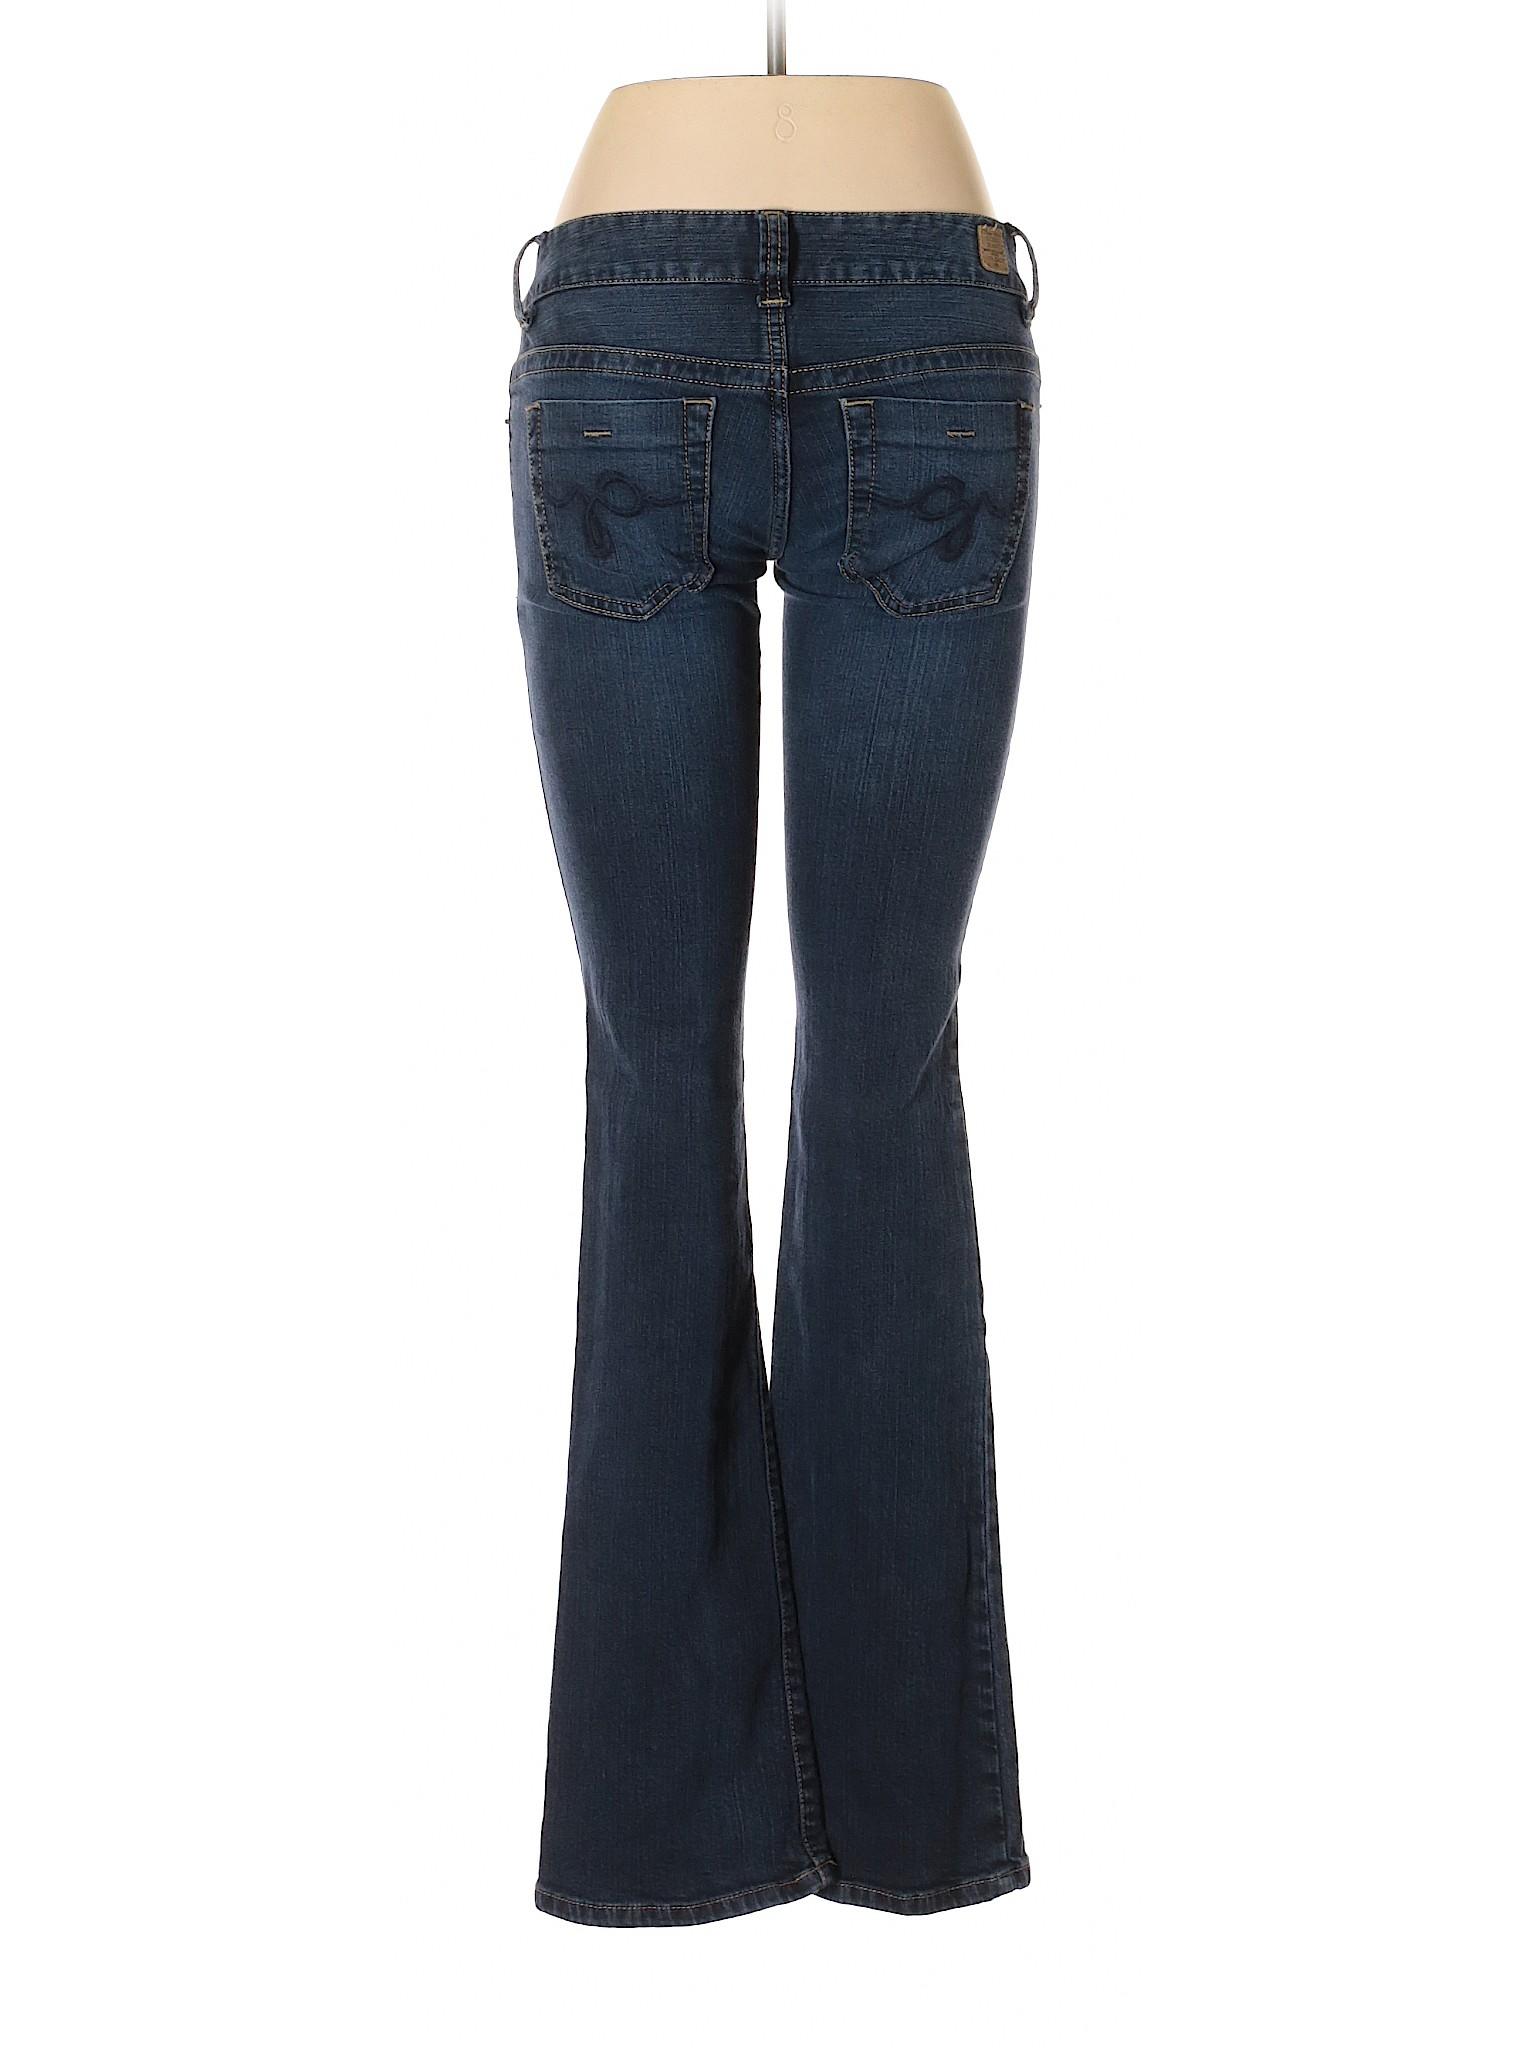 Promotion Guess Promotion Jeans Jeans Jeans Guess Guess Promotion Promotion Guess Jeans 1RqnS